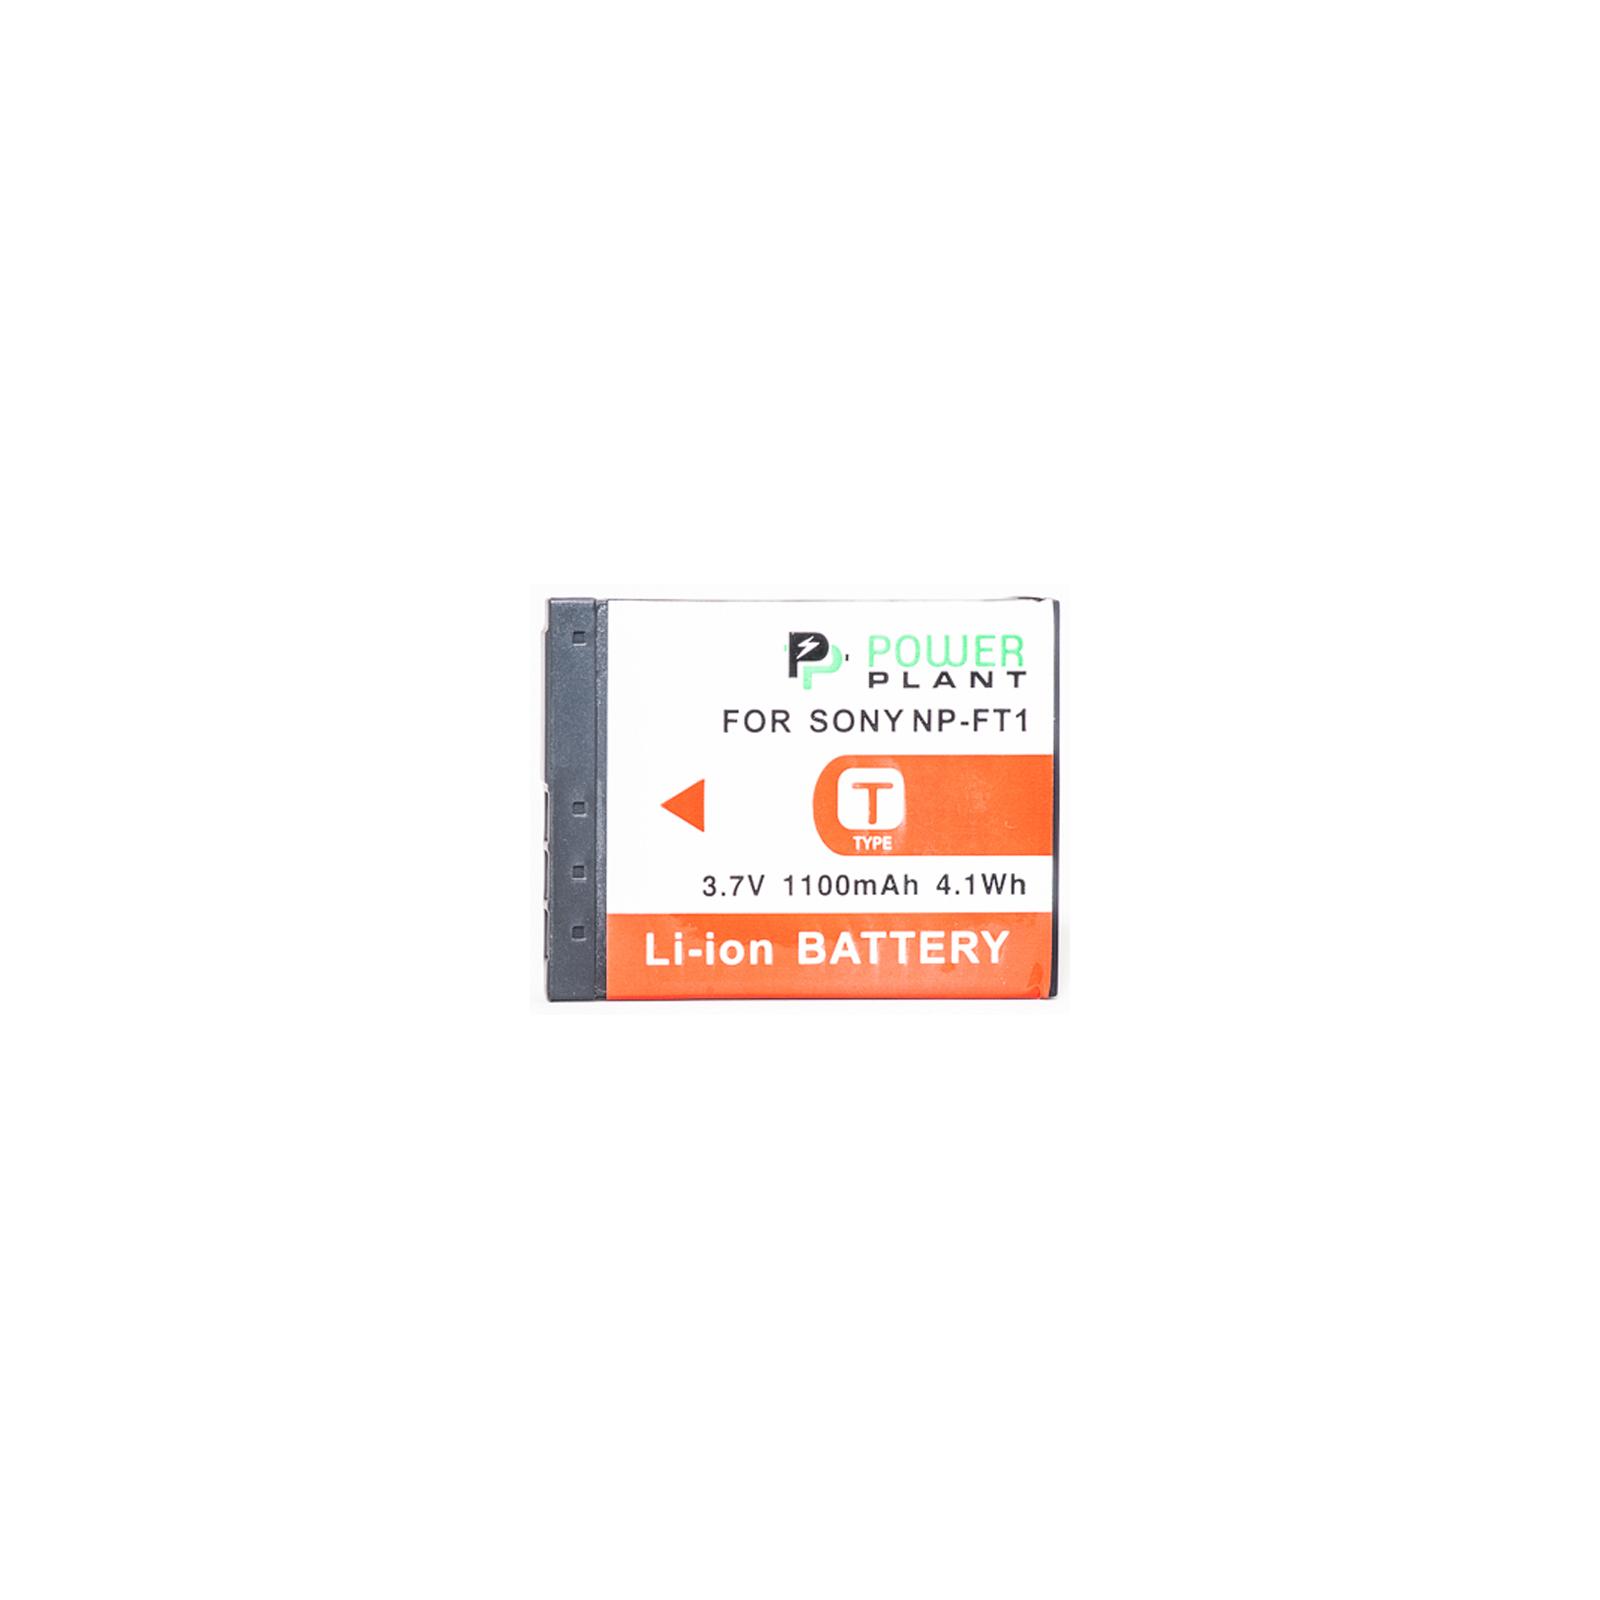 Аккумулятор к фото/видео PowerPlant Sony NP-FT1 (DV00DV1020) изображение 2